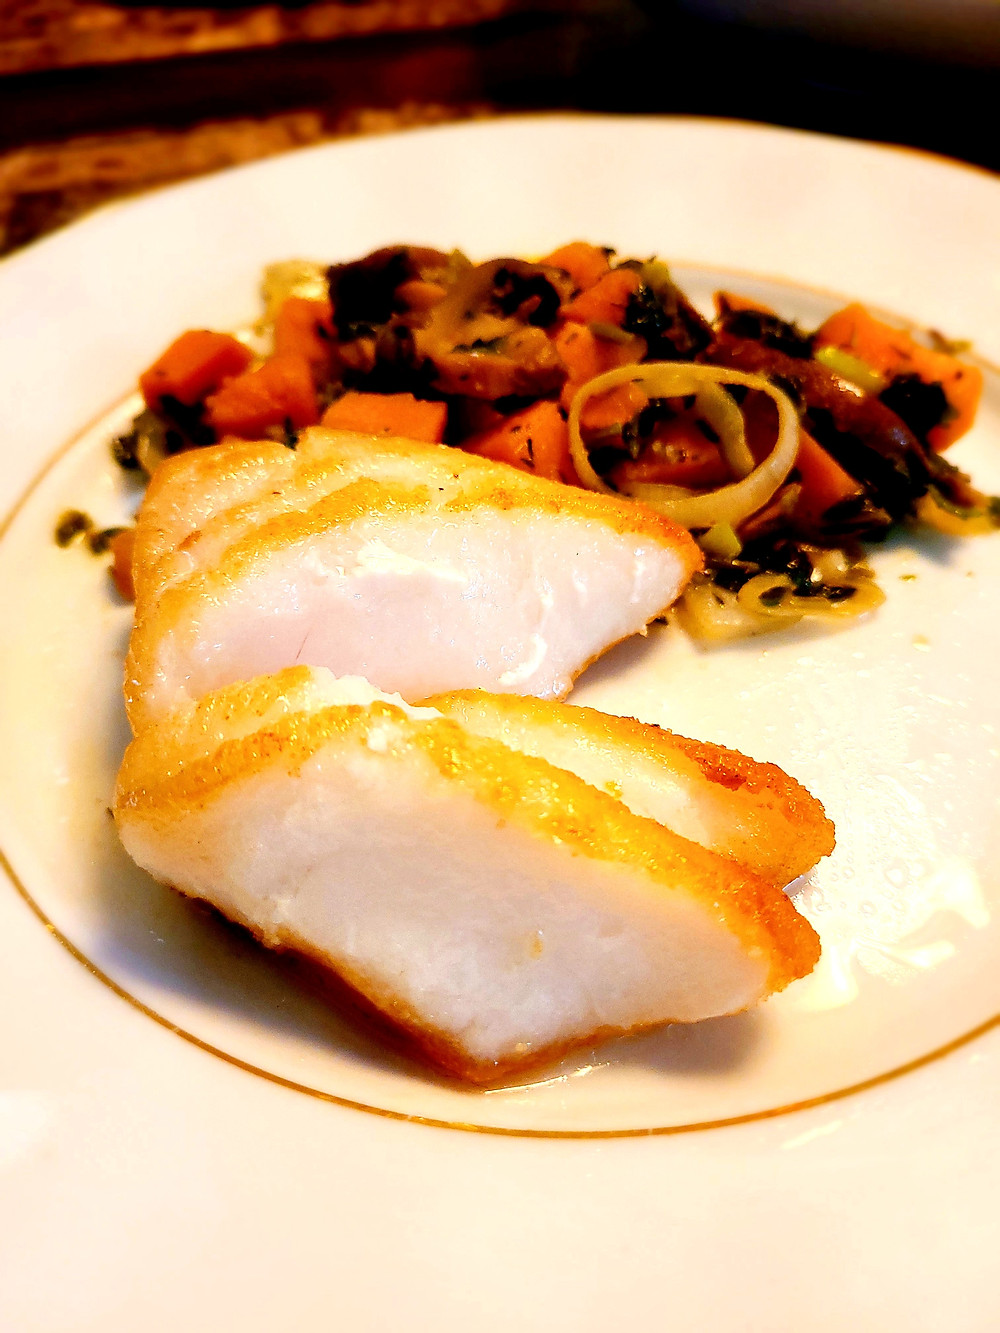 Pan-Seared Chilean Sea Bass (no gluten, soy, dairy, grains)